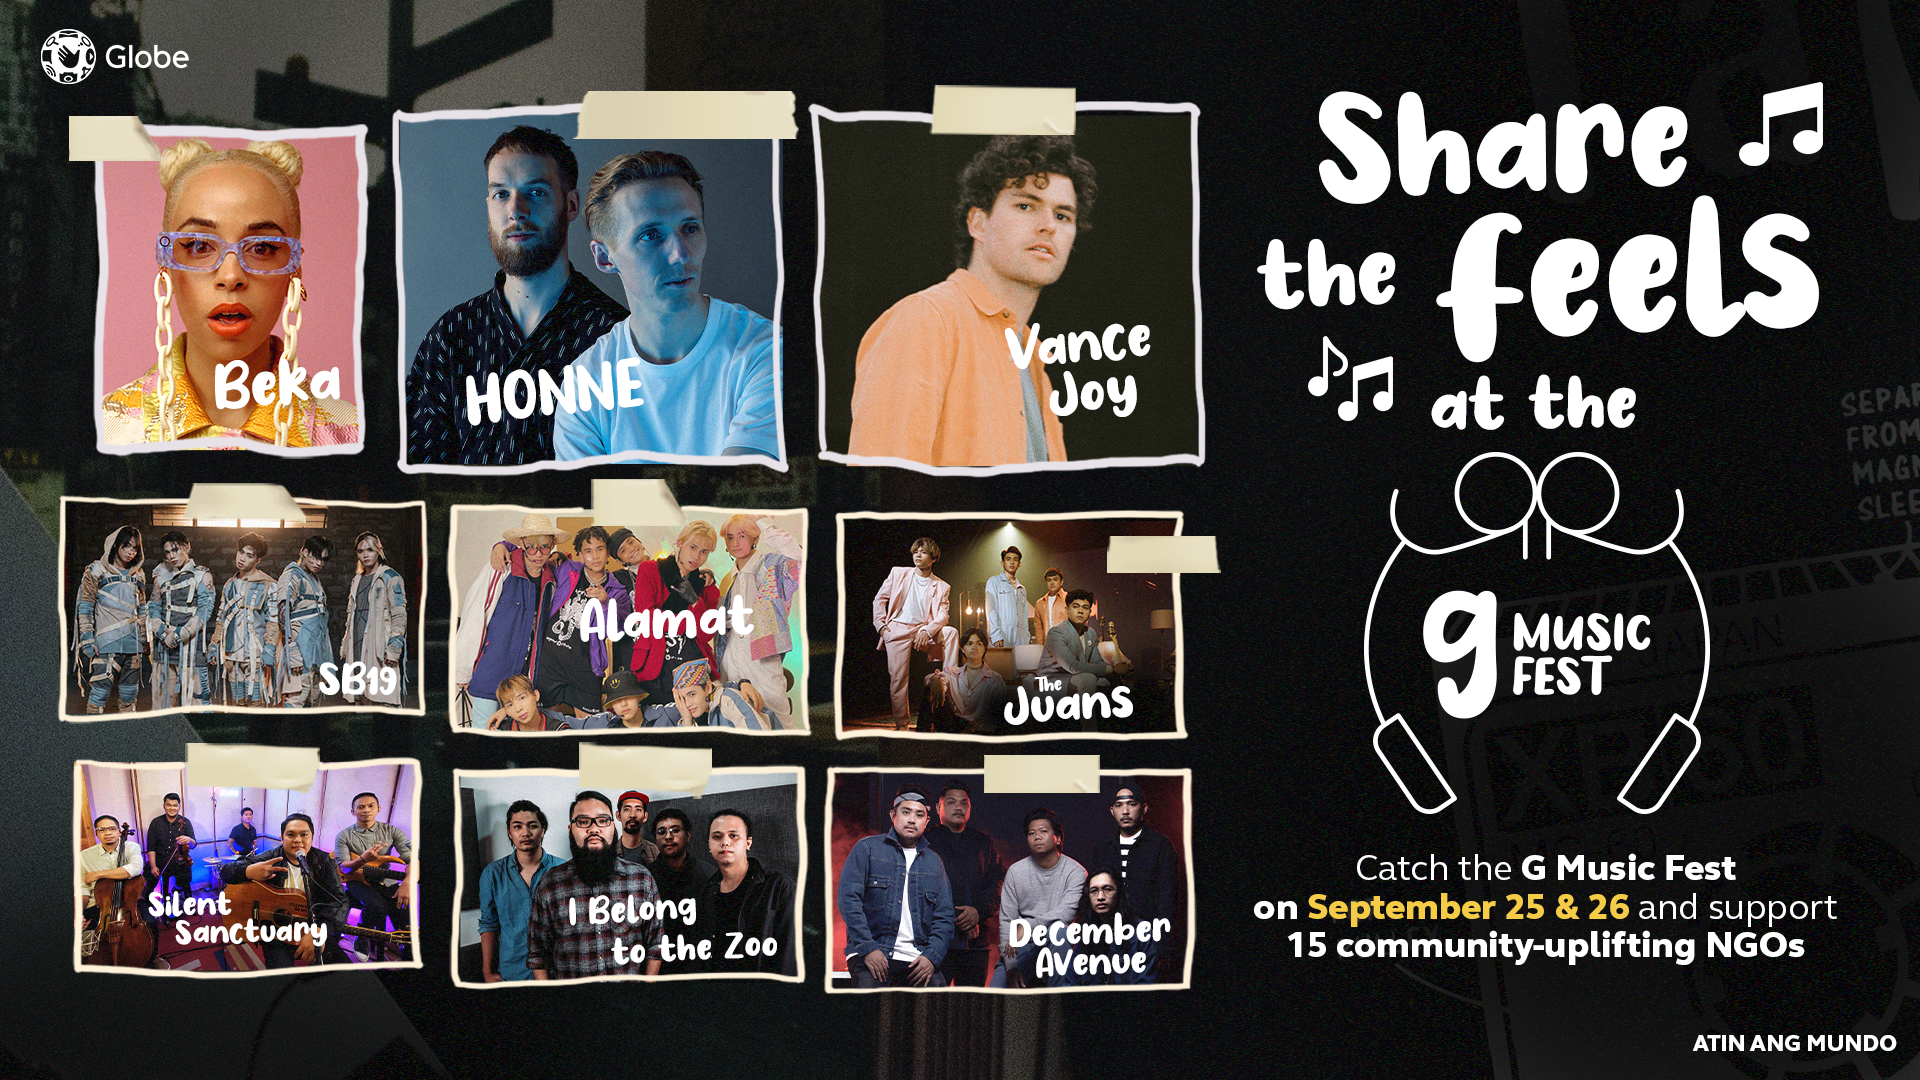 Honne, Vance Joy, Beka, SB19, Many More to Perform at G Music Fest 2021